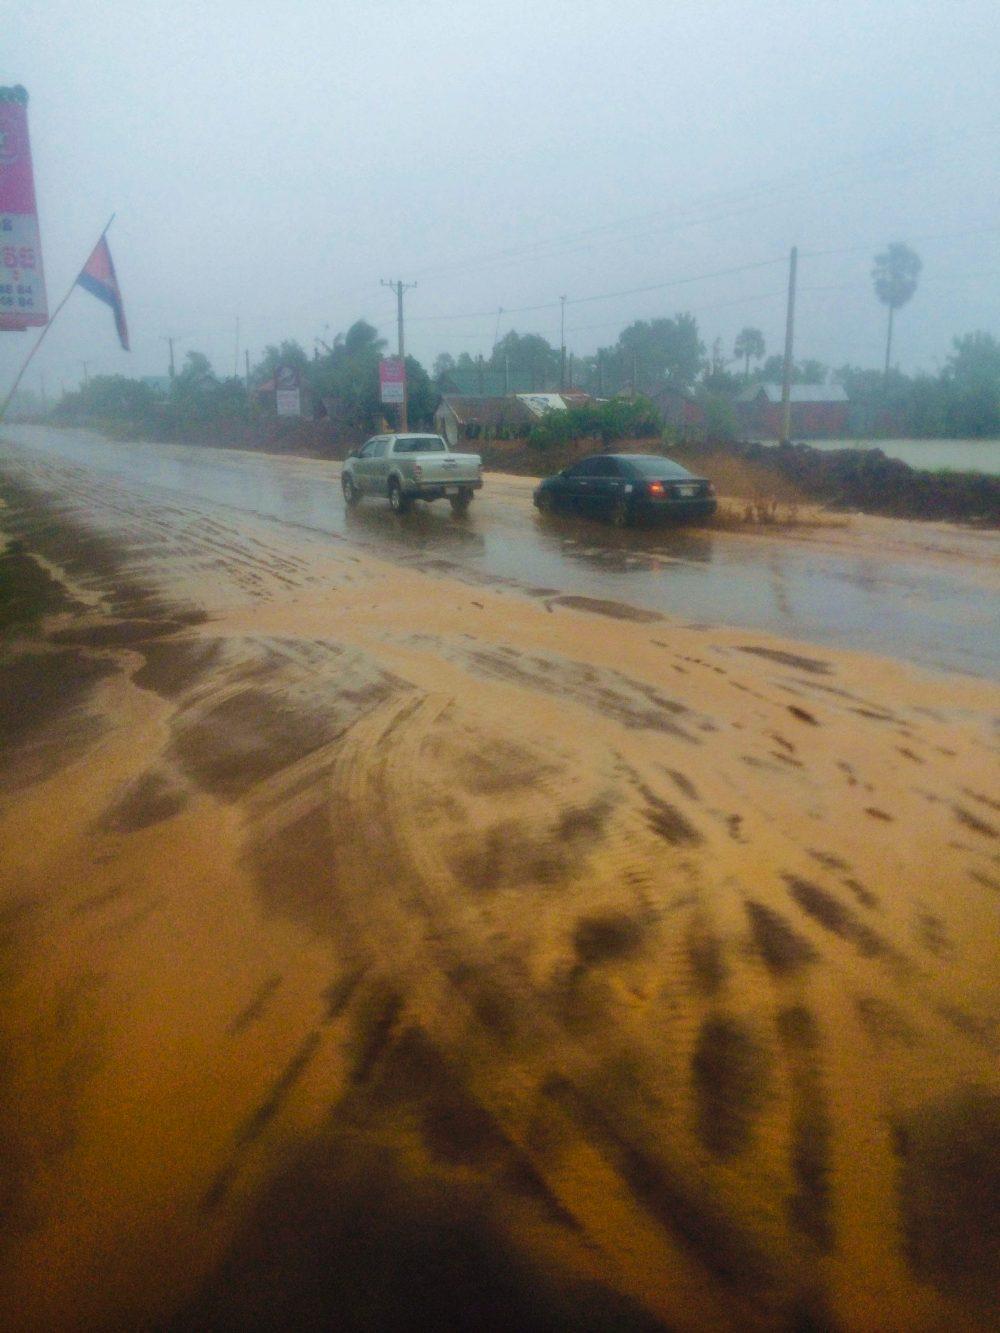 Heavy rain in Cambodia